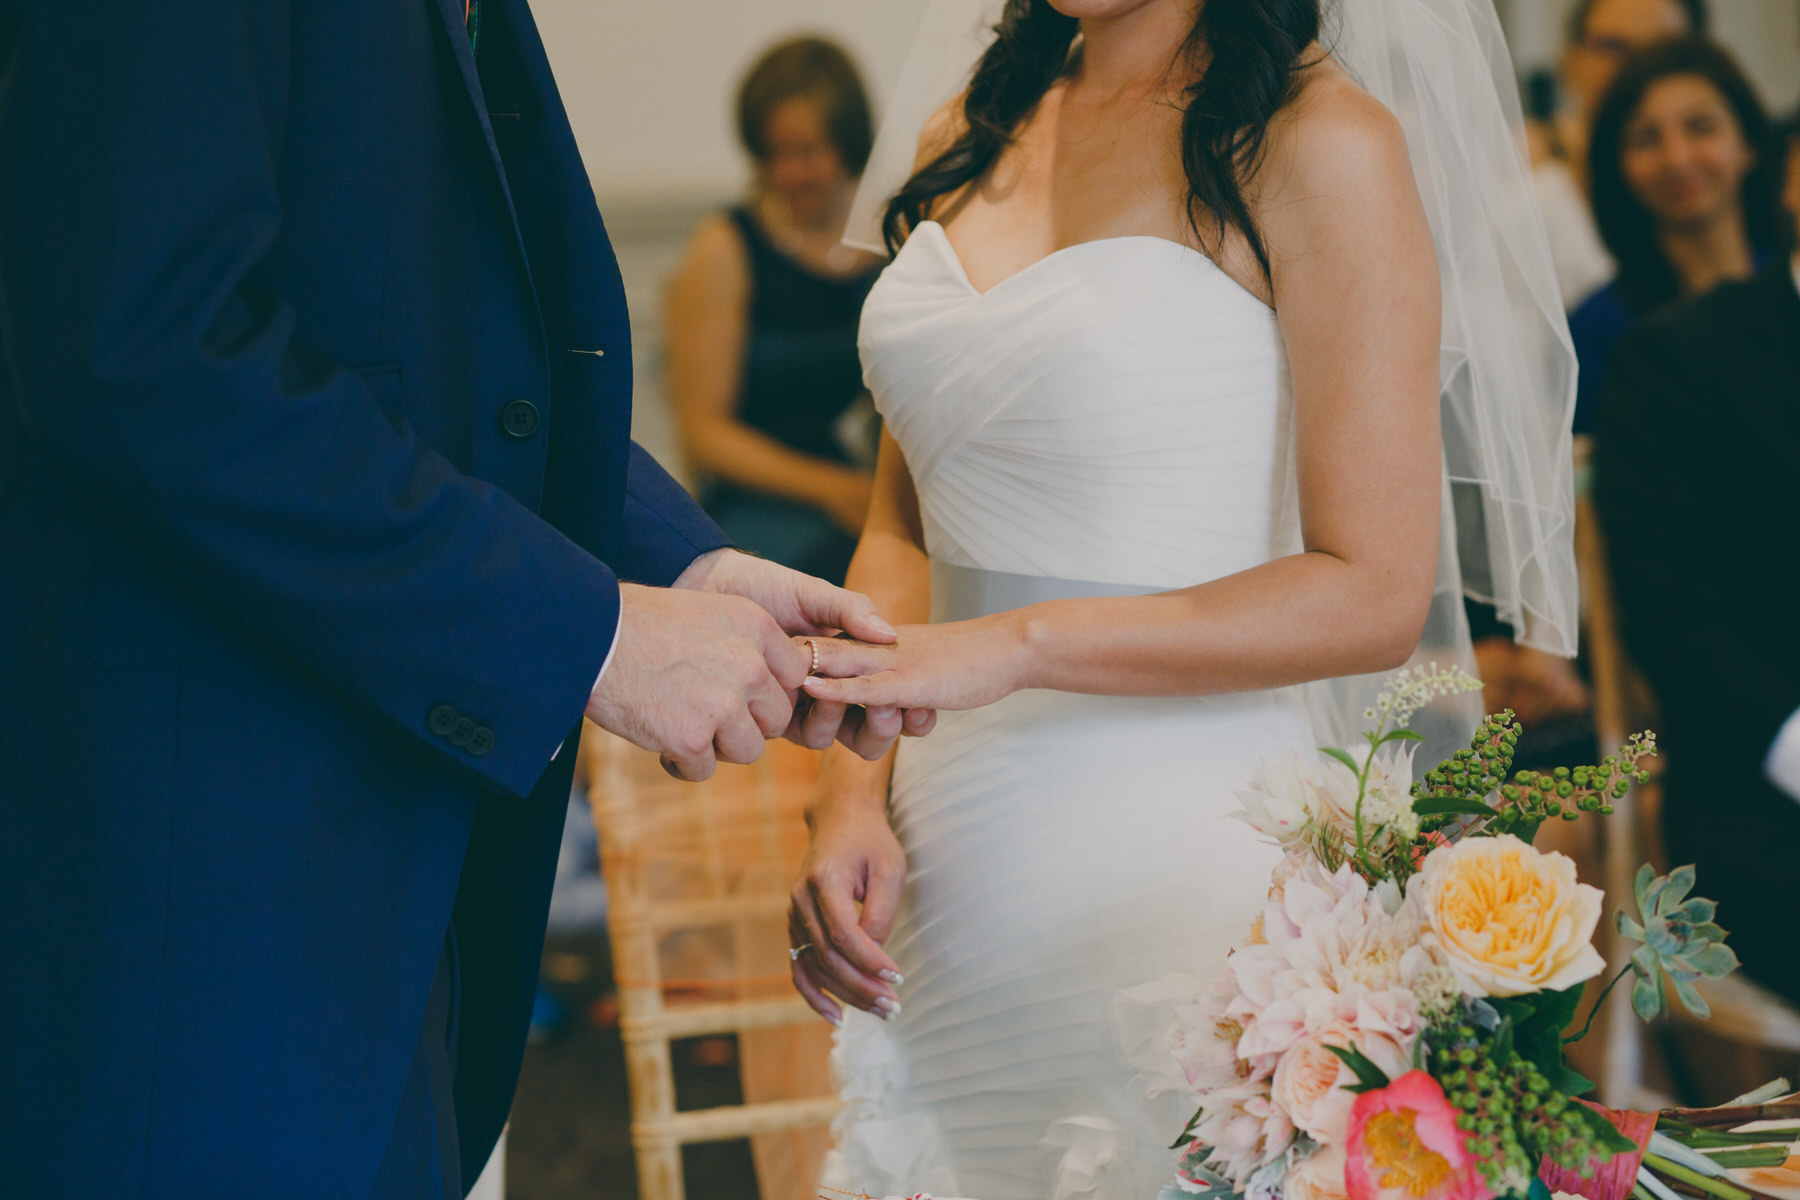 185 exchanging rings Surrey wedding ceremony.jpg